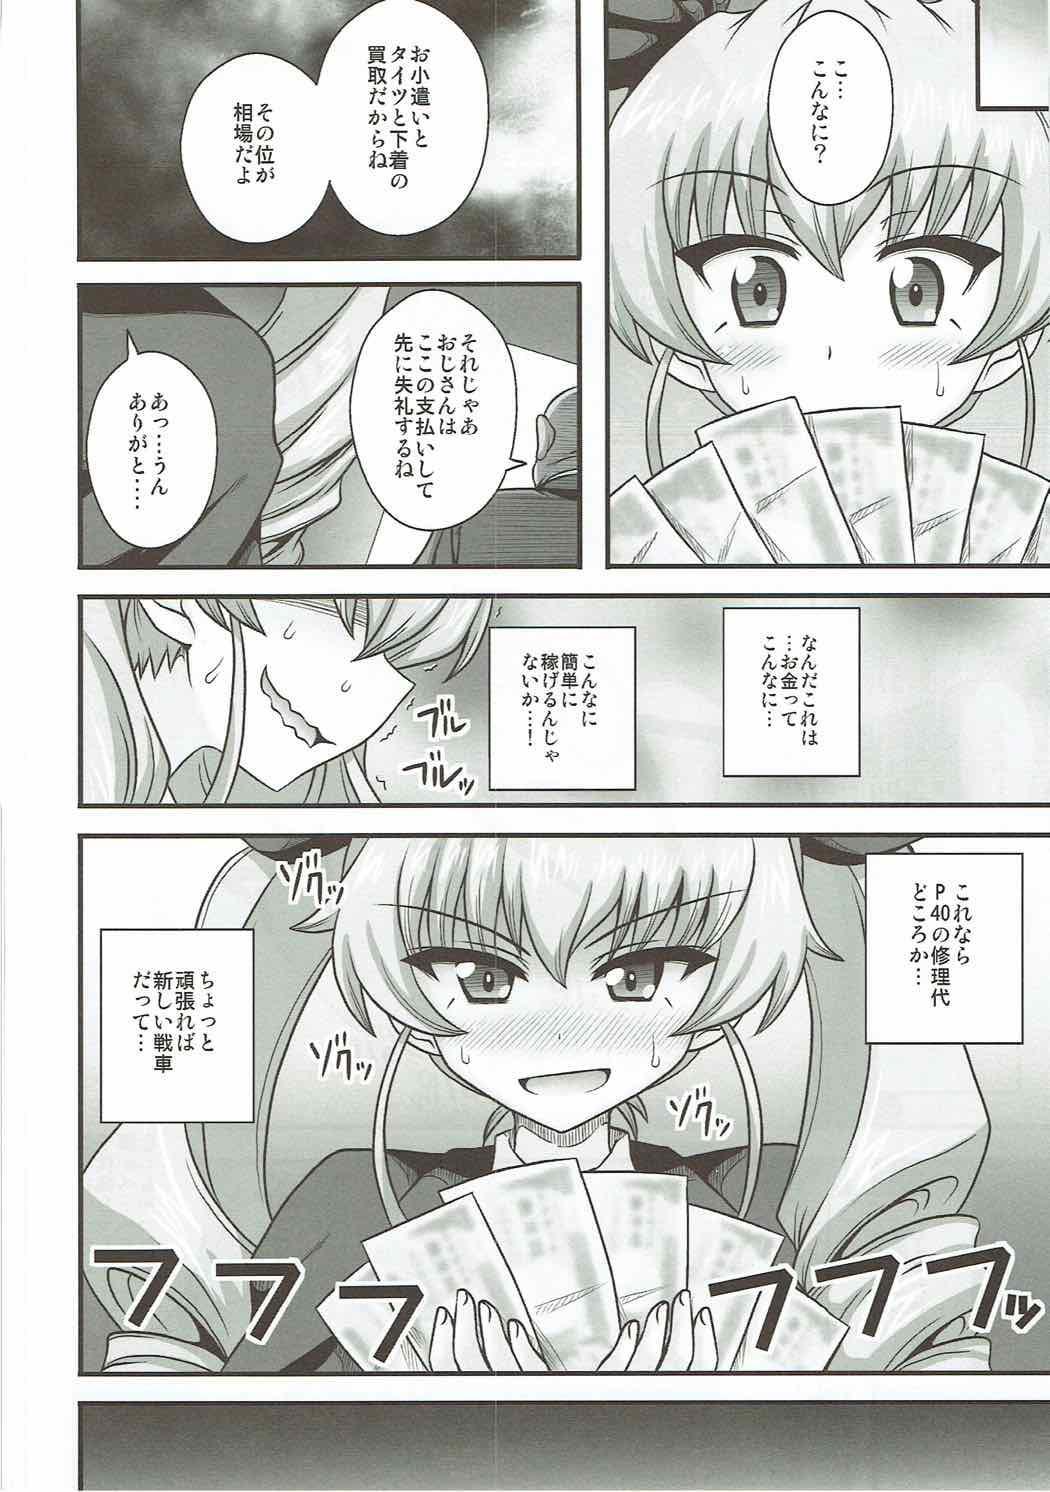 Anzio Enkou Chiyomi 17-sai 10